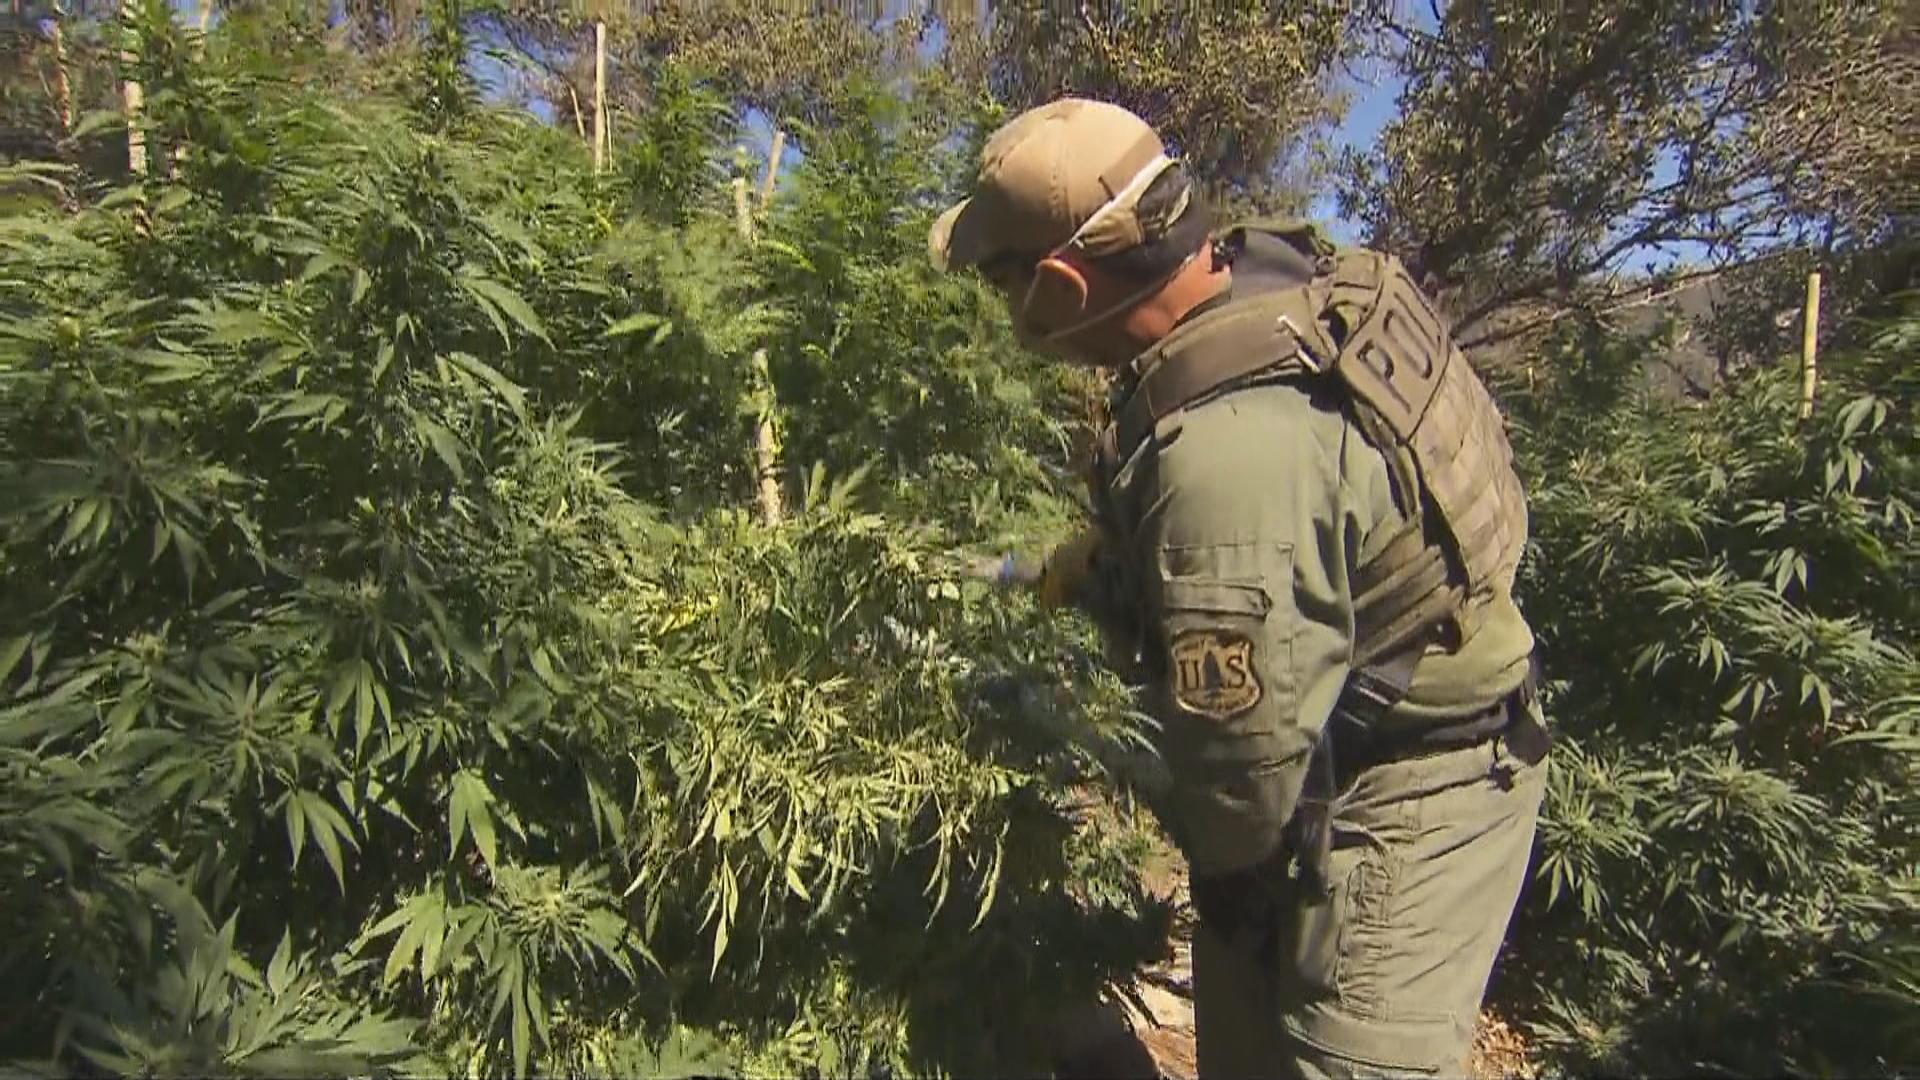 Illegal marijuana farms ravage America's national forests